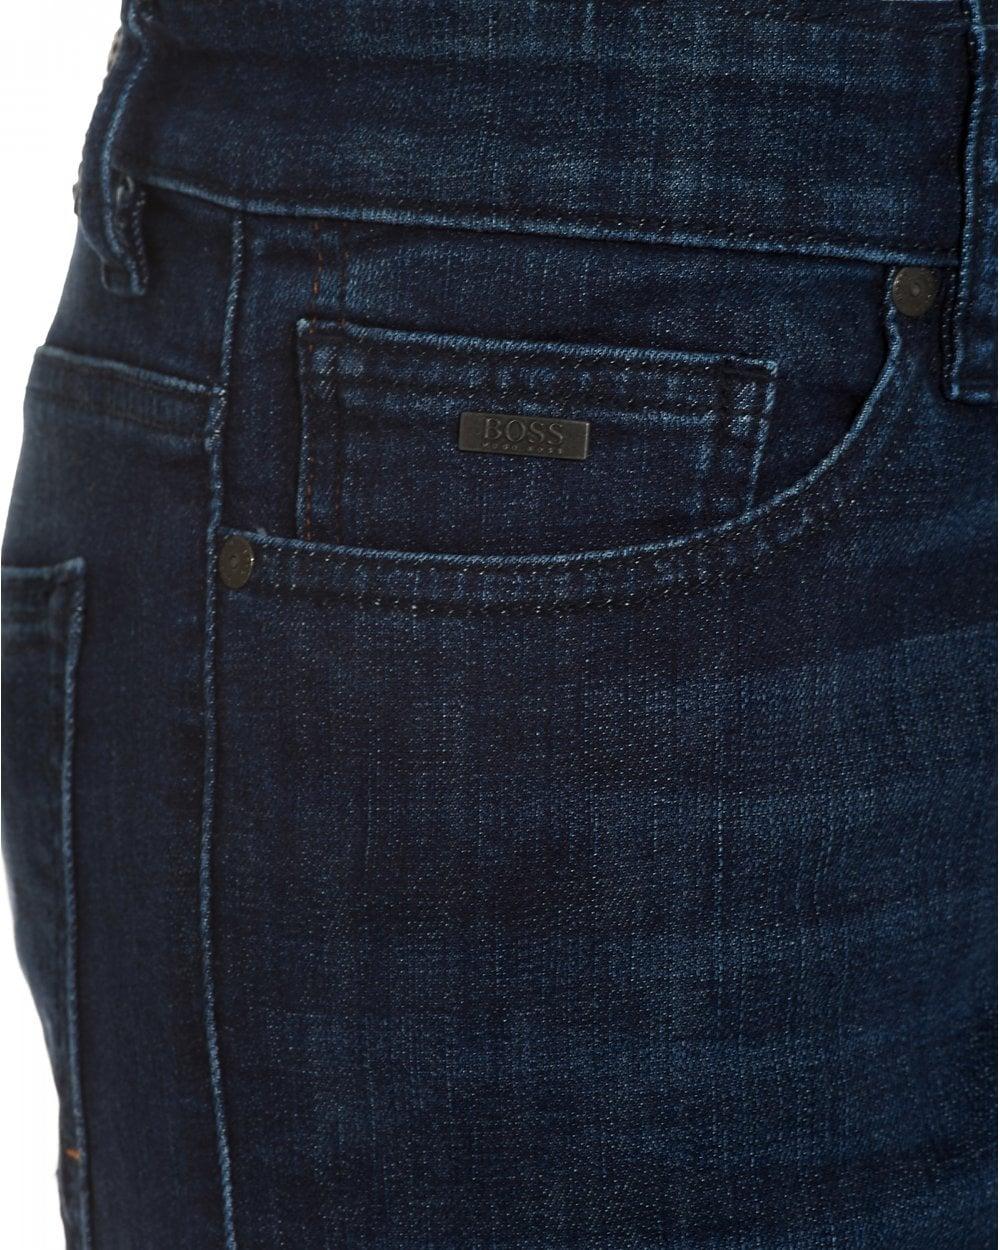 BOSS Casual Mens Delaware Jeans d129d1ded